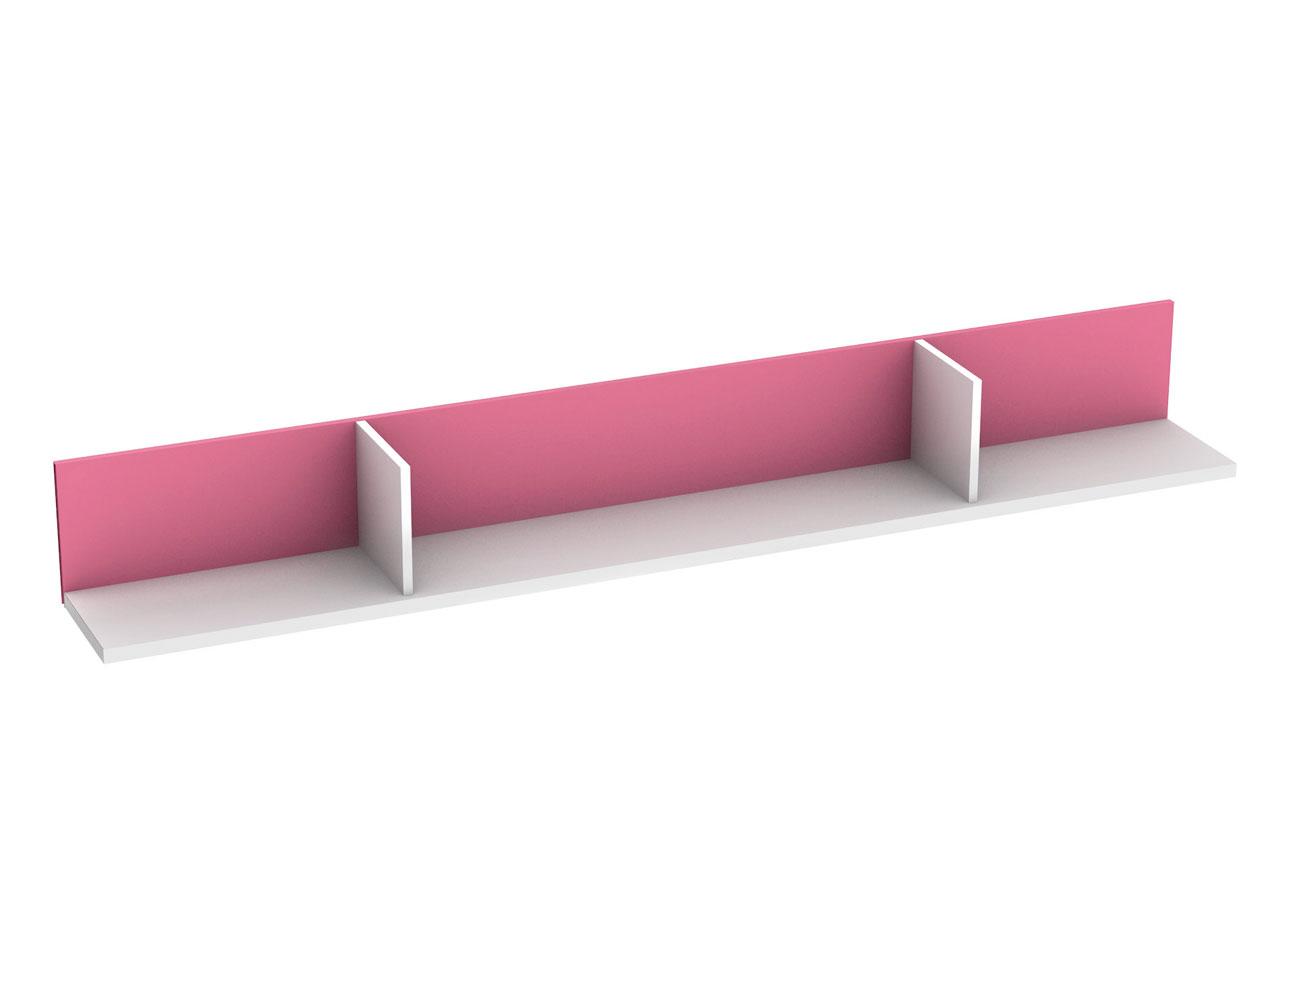 Estanteria horizontal blanca rosa 808